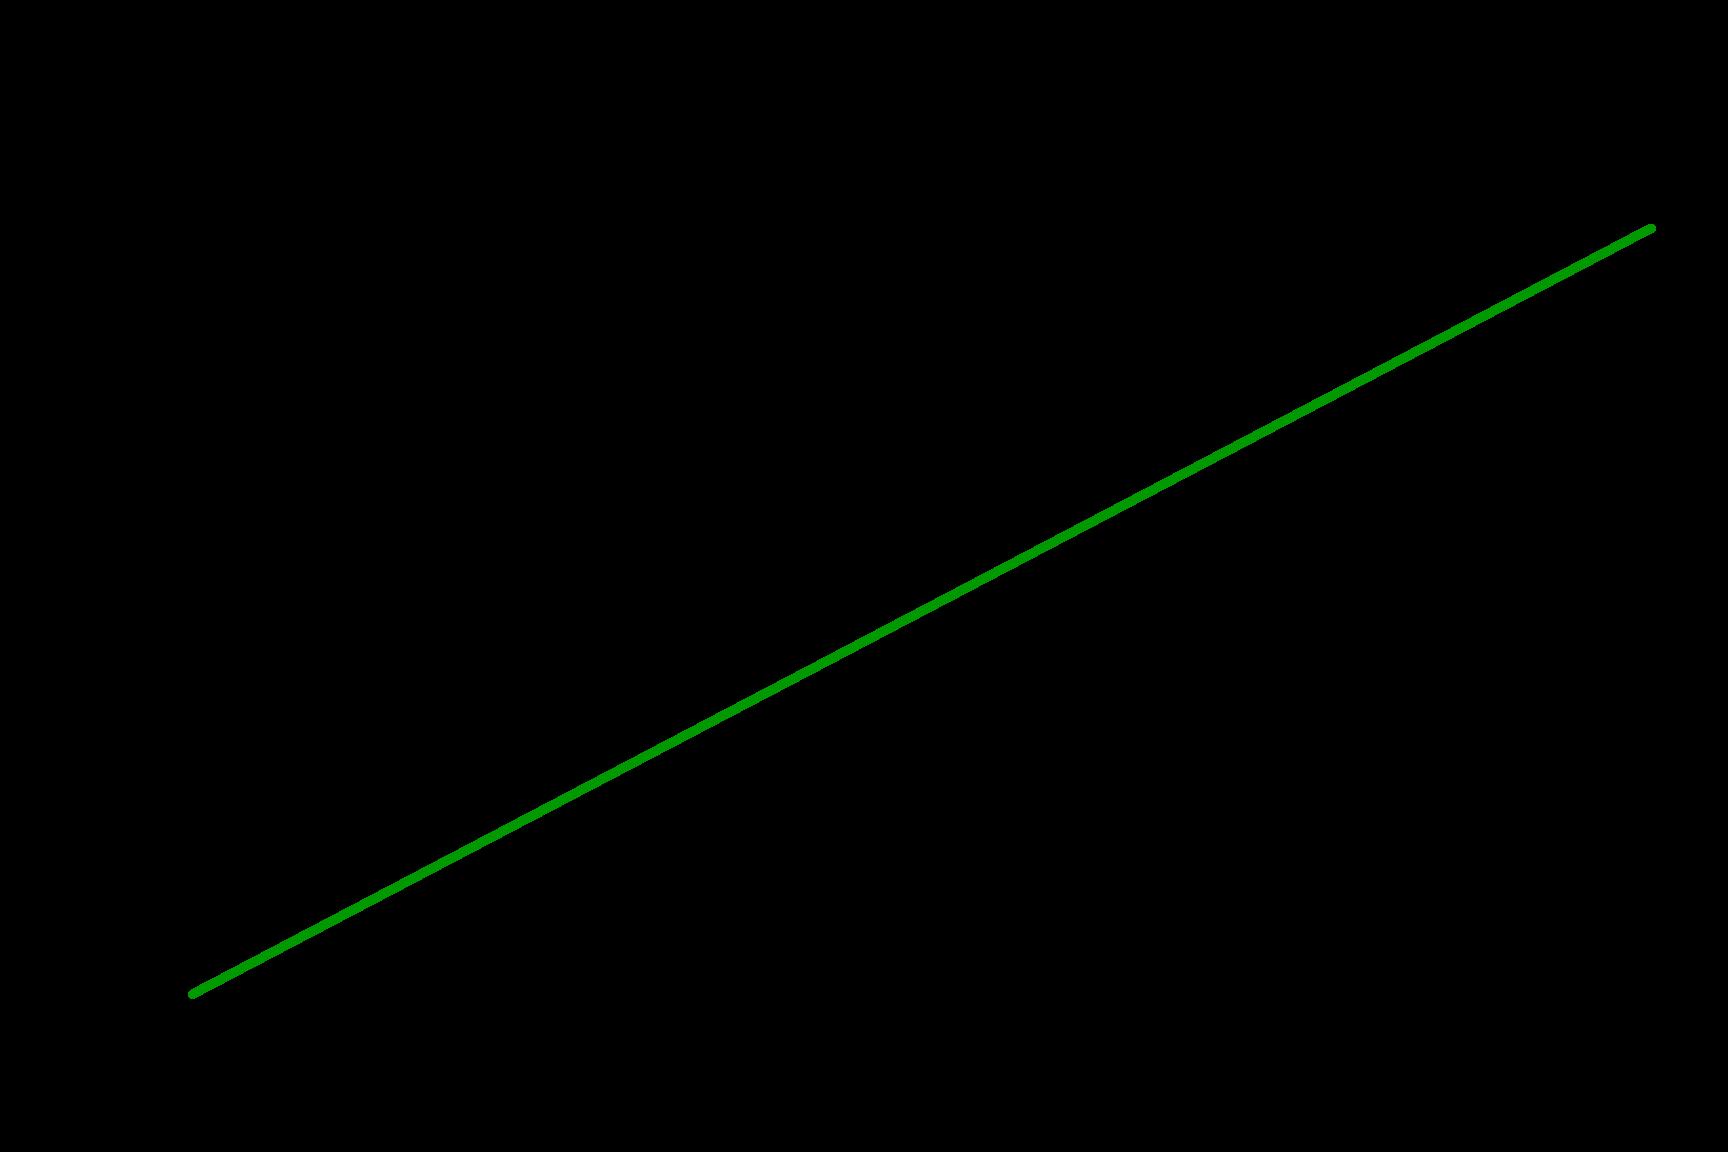 ardeches_correlation_impressions_v2.png